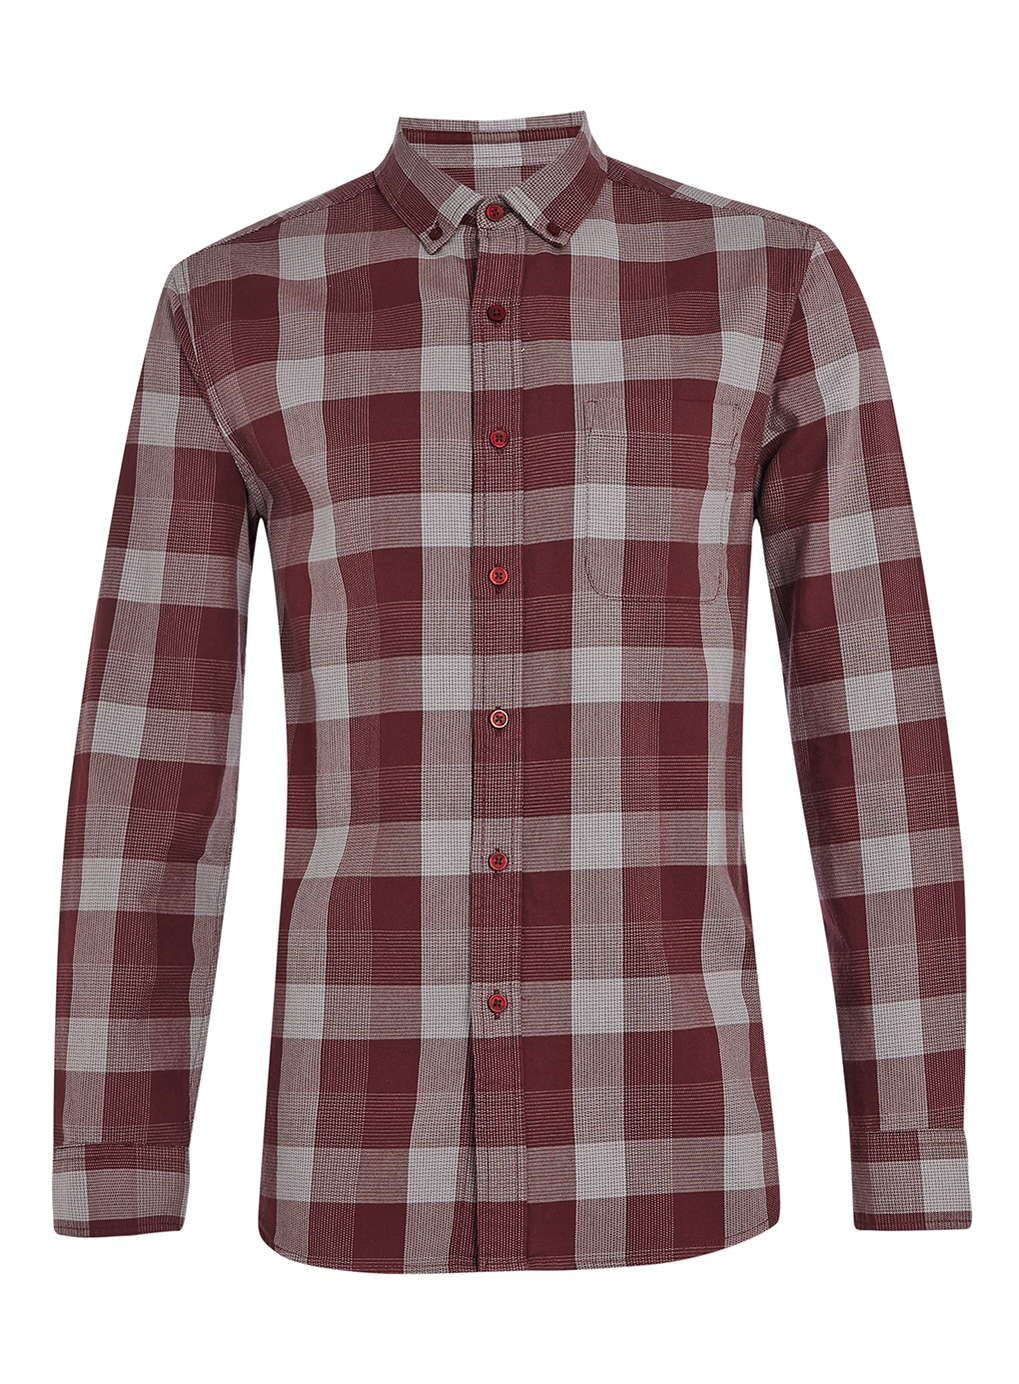 Topman Burgundy Grey Basket Casual Check Long Sleeve Shirt